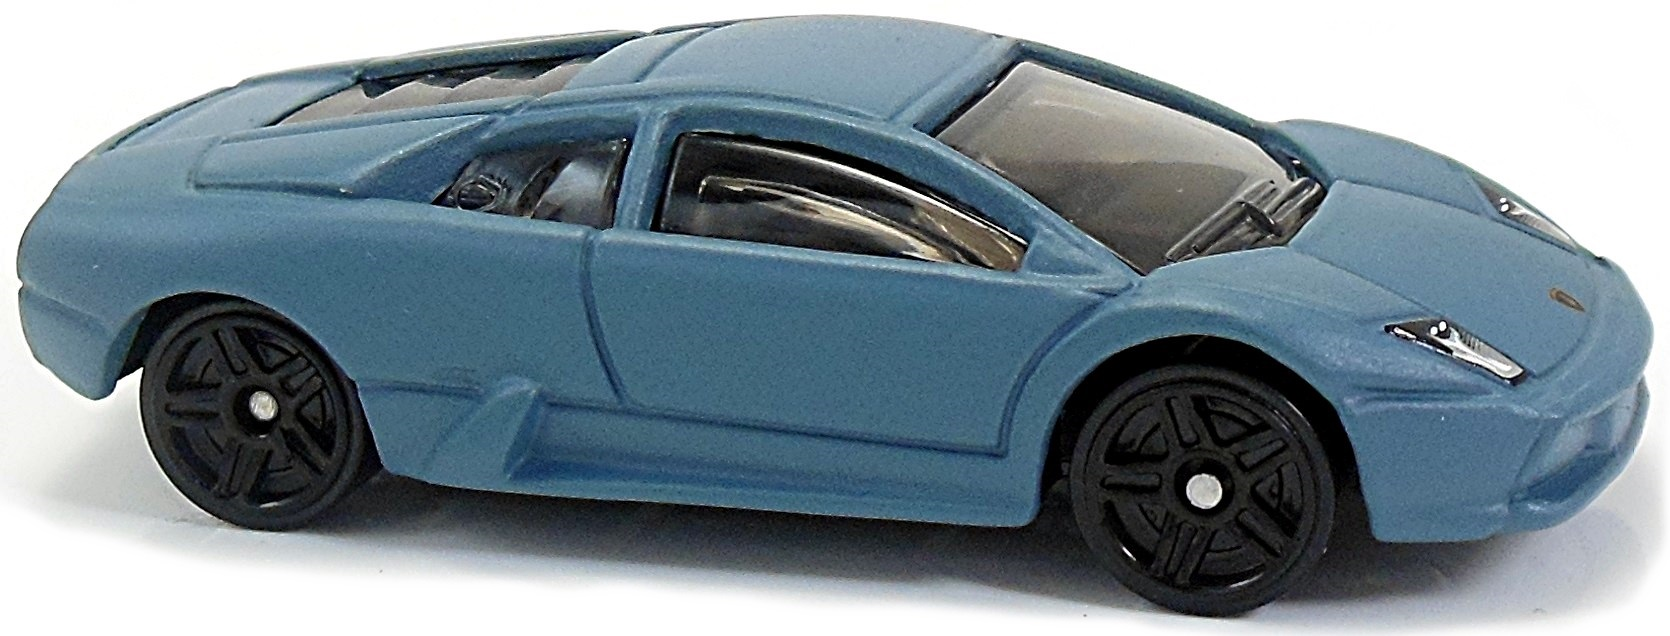 Lamborghini Murcielago I Hot Wheels Newsletter